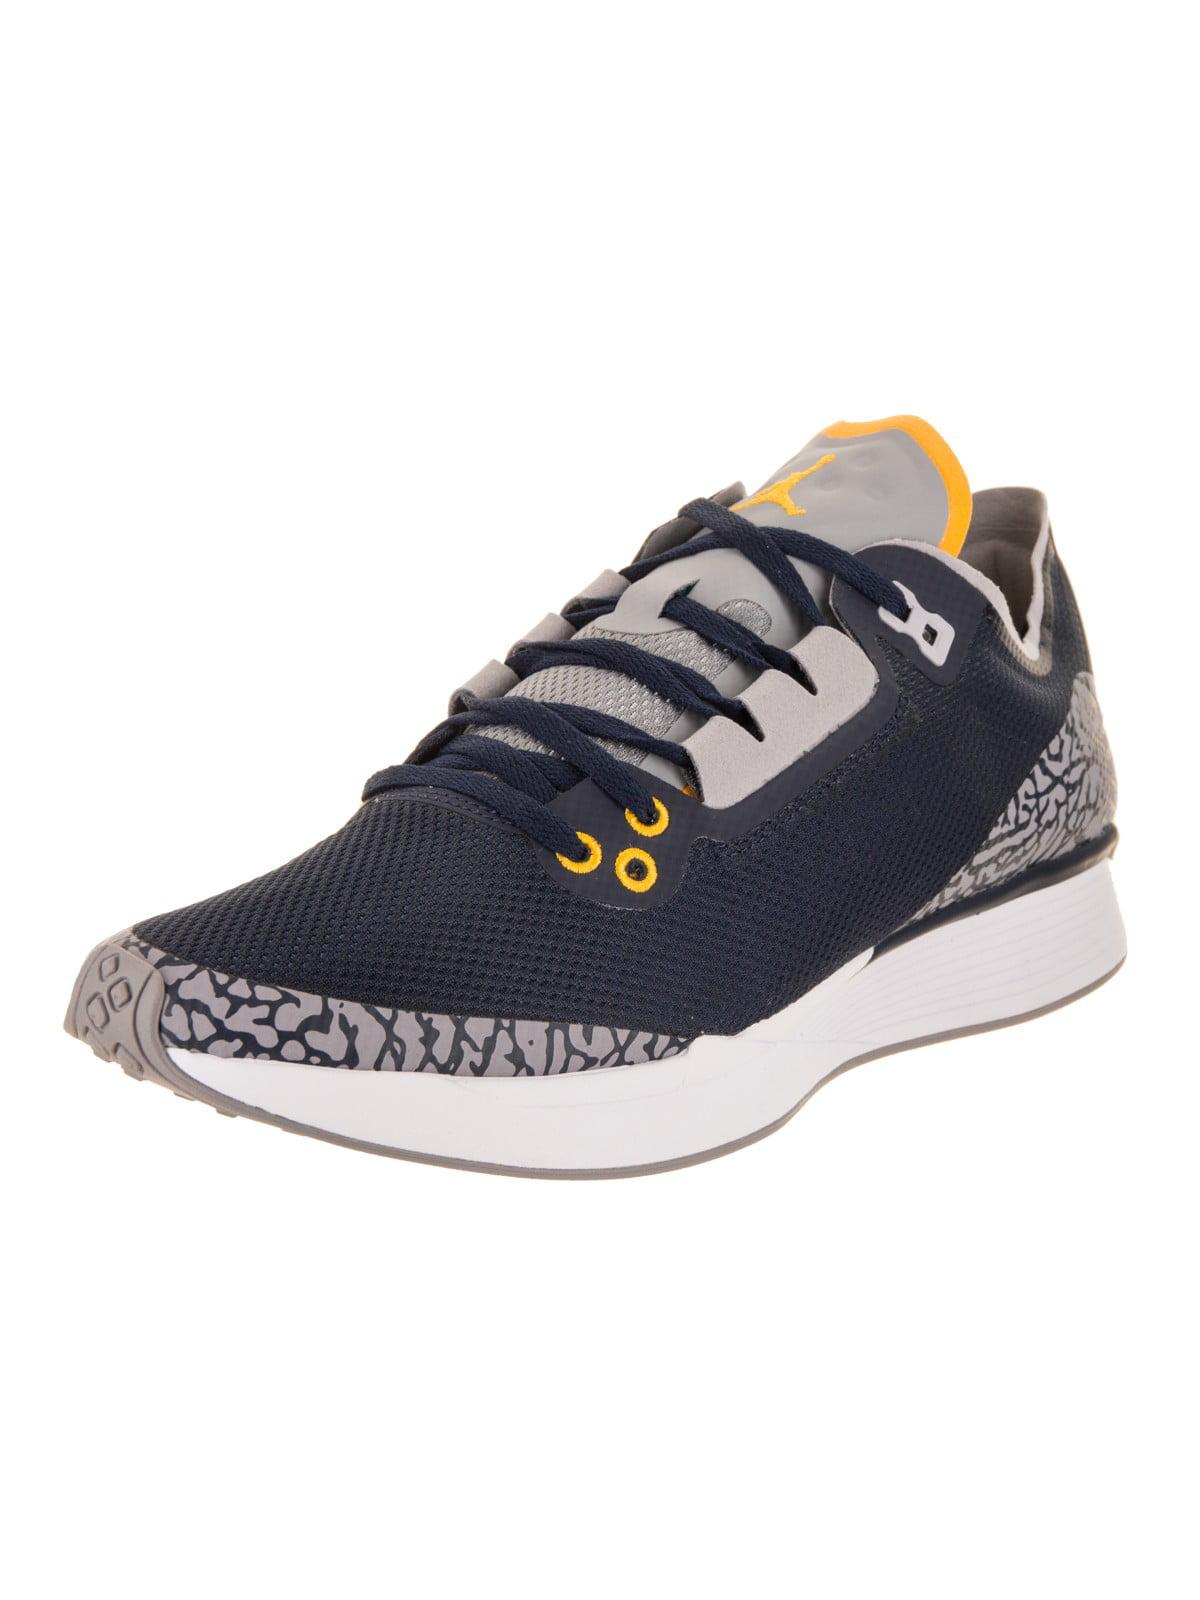 Jordan 88 Racer Running Shoe - Walmart